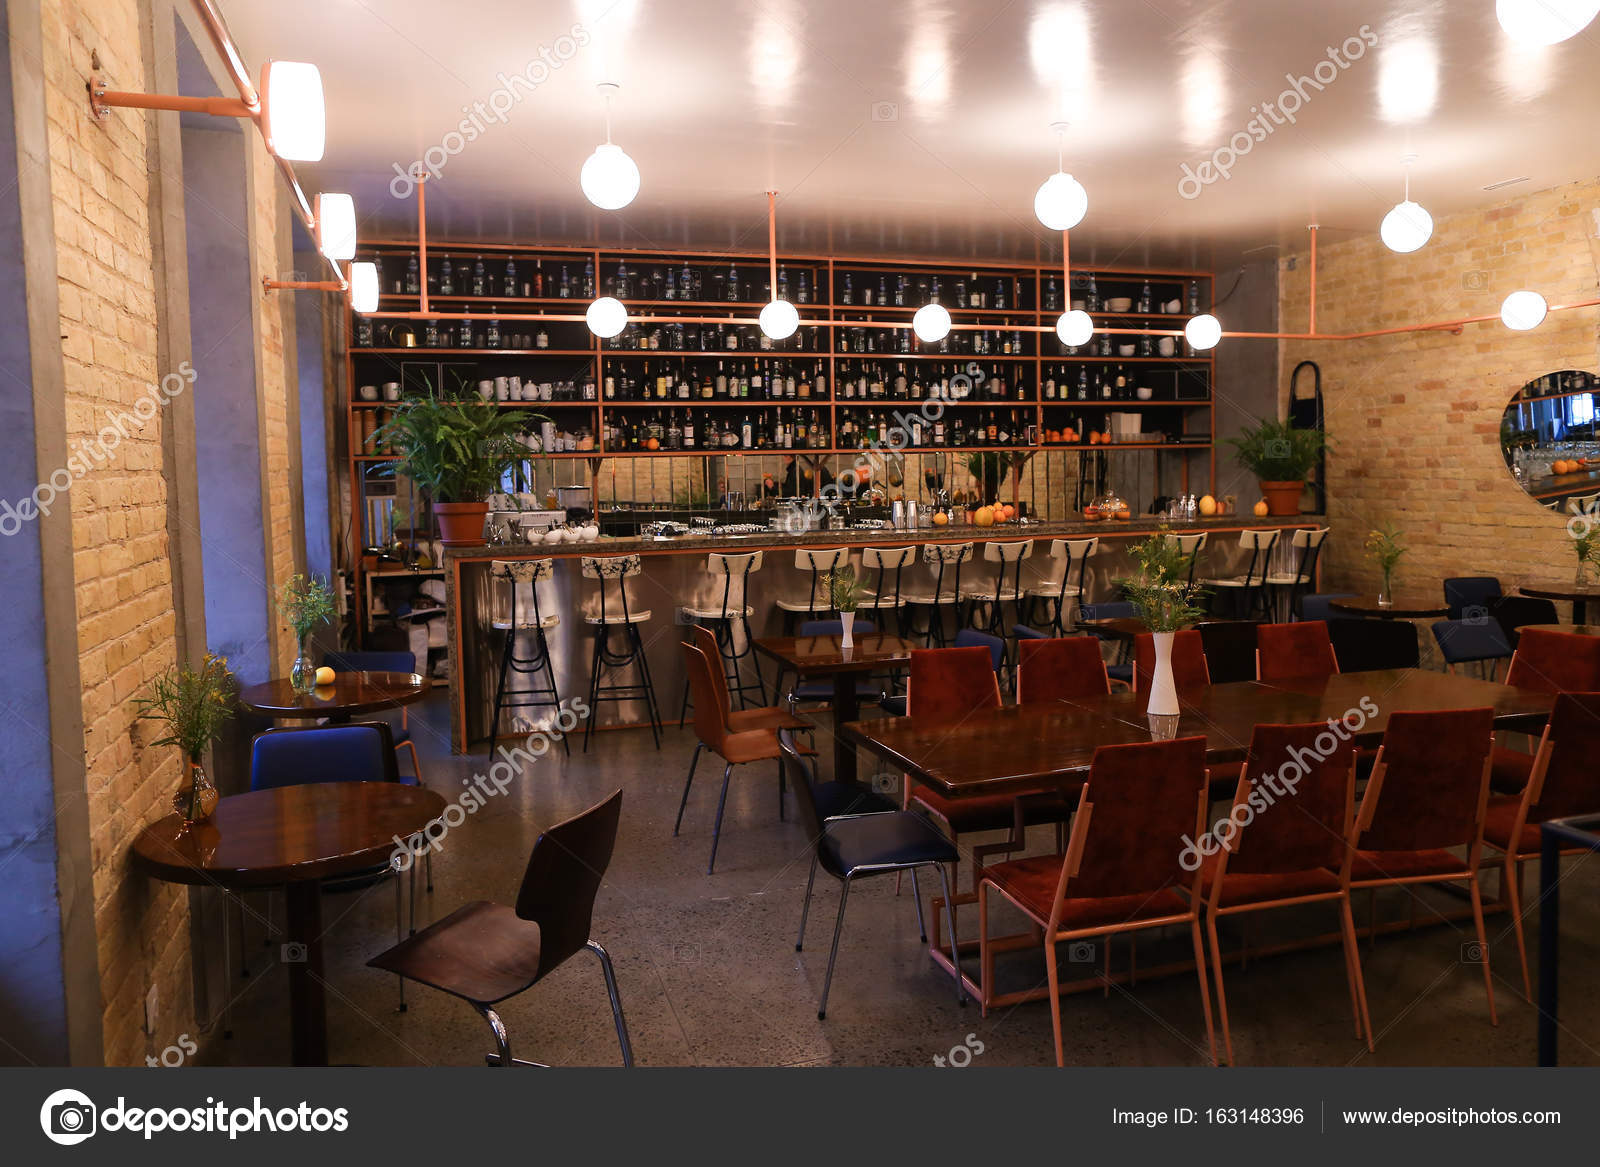 Design-Ideen trendige Café oder Restaurant zu erfassen, weil Bar ...